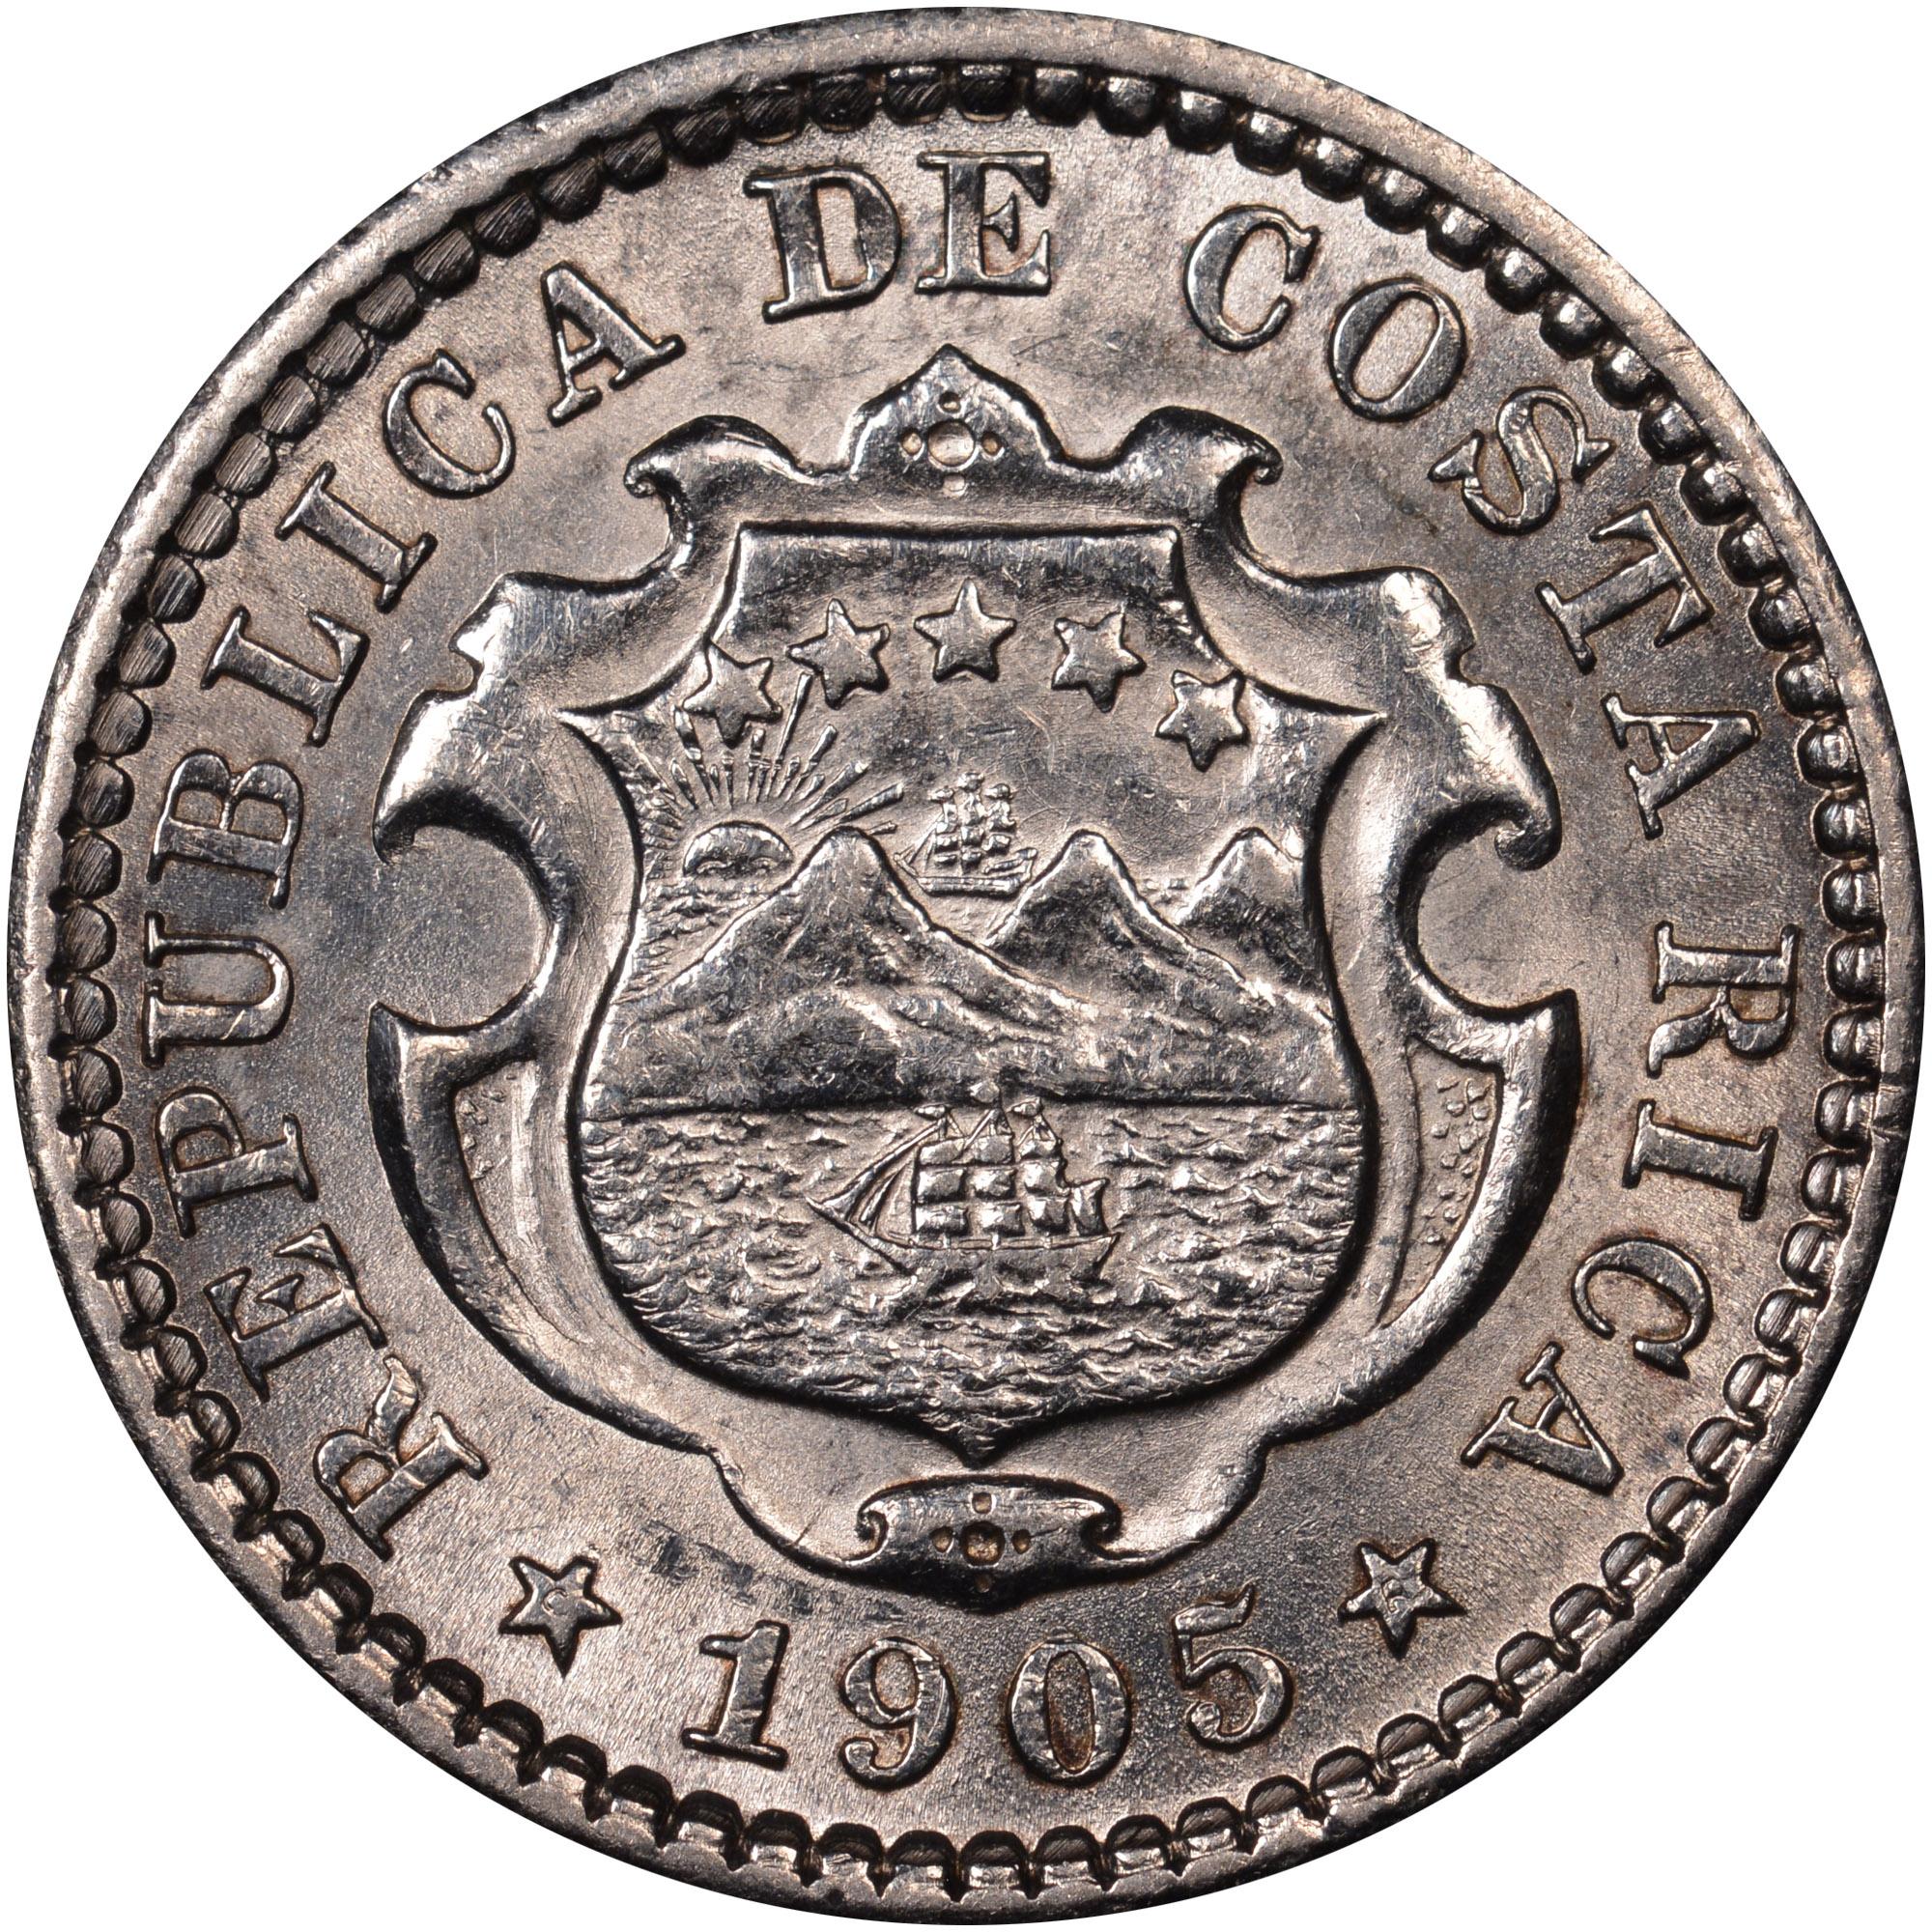 1905-1914 Costa Rica 10 Centimos obverse